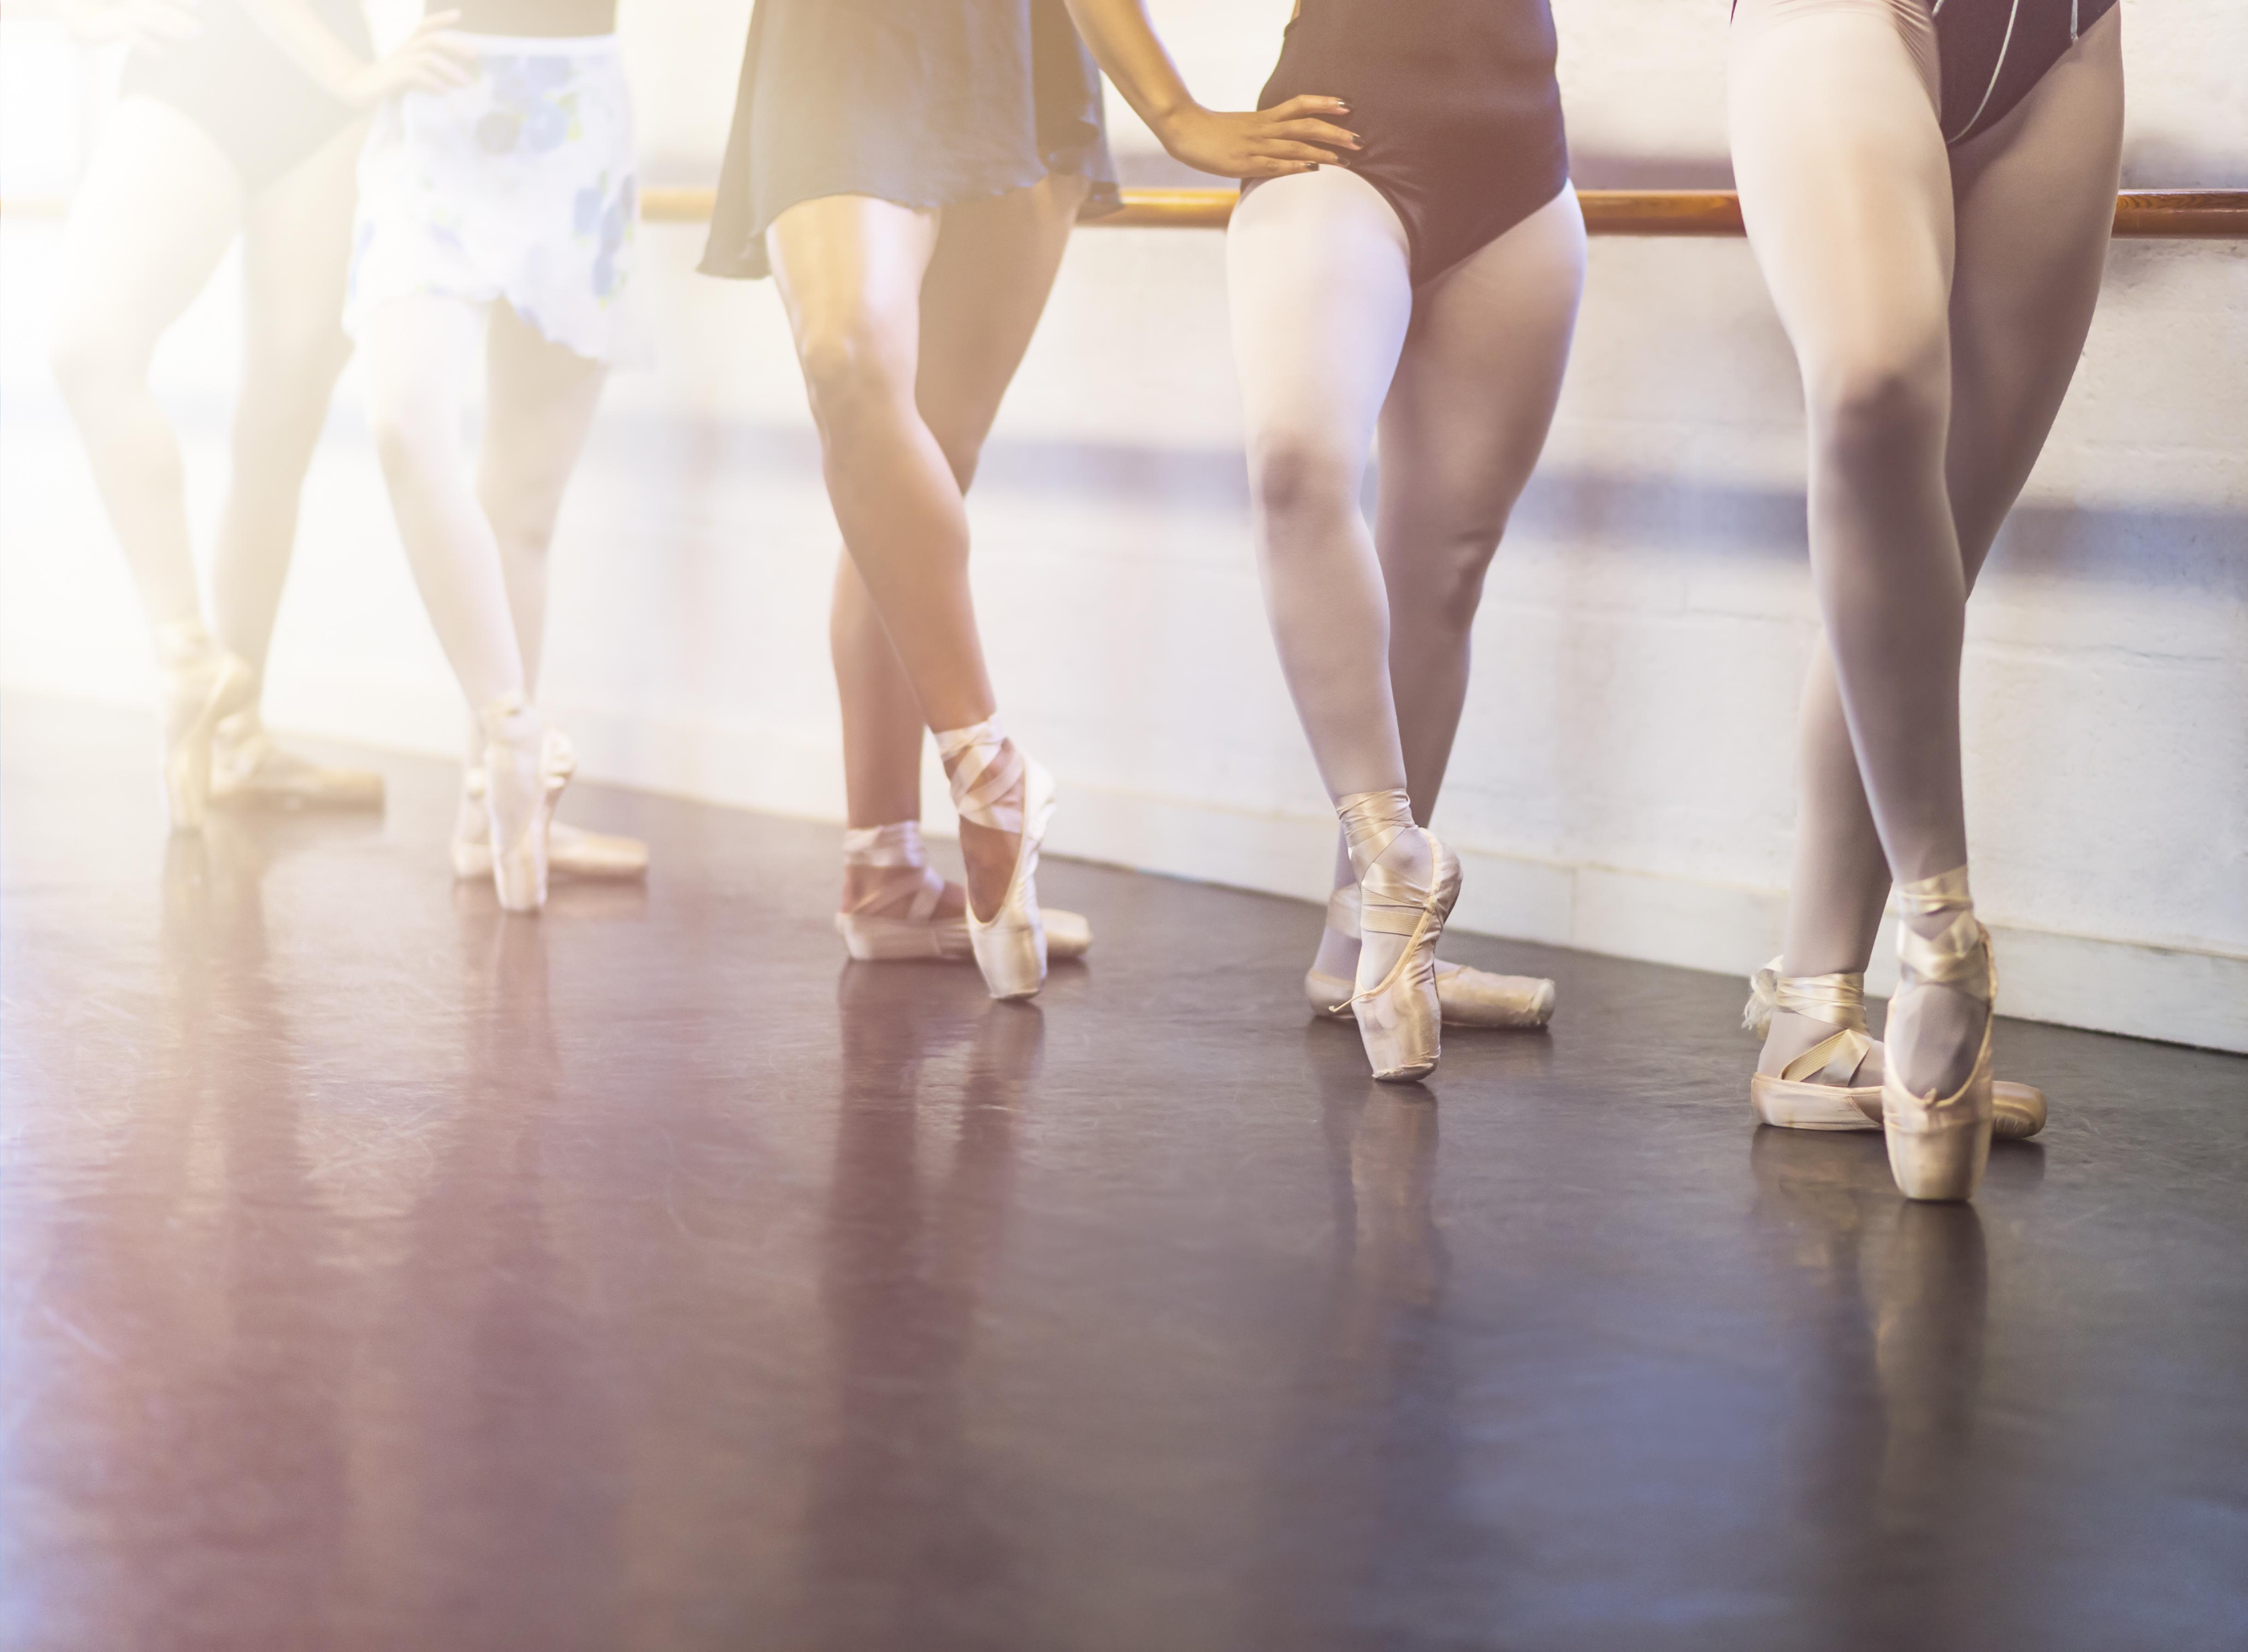 USA, Florida, Jupiter, Young women dancing in dance studio